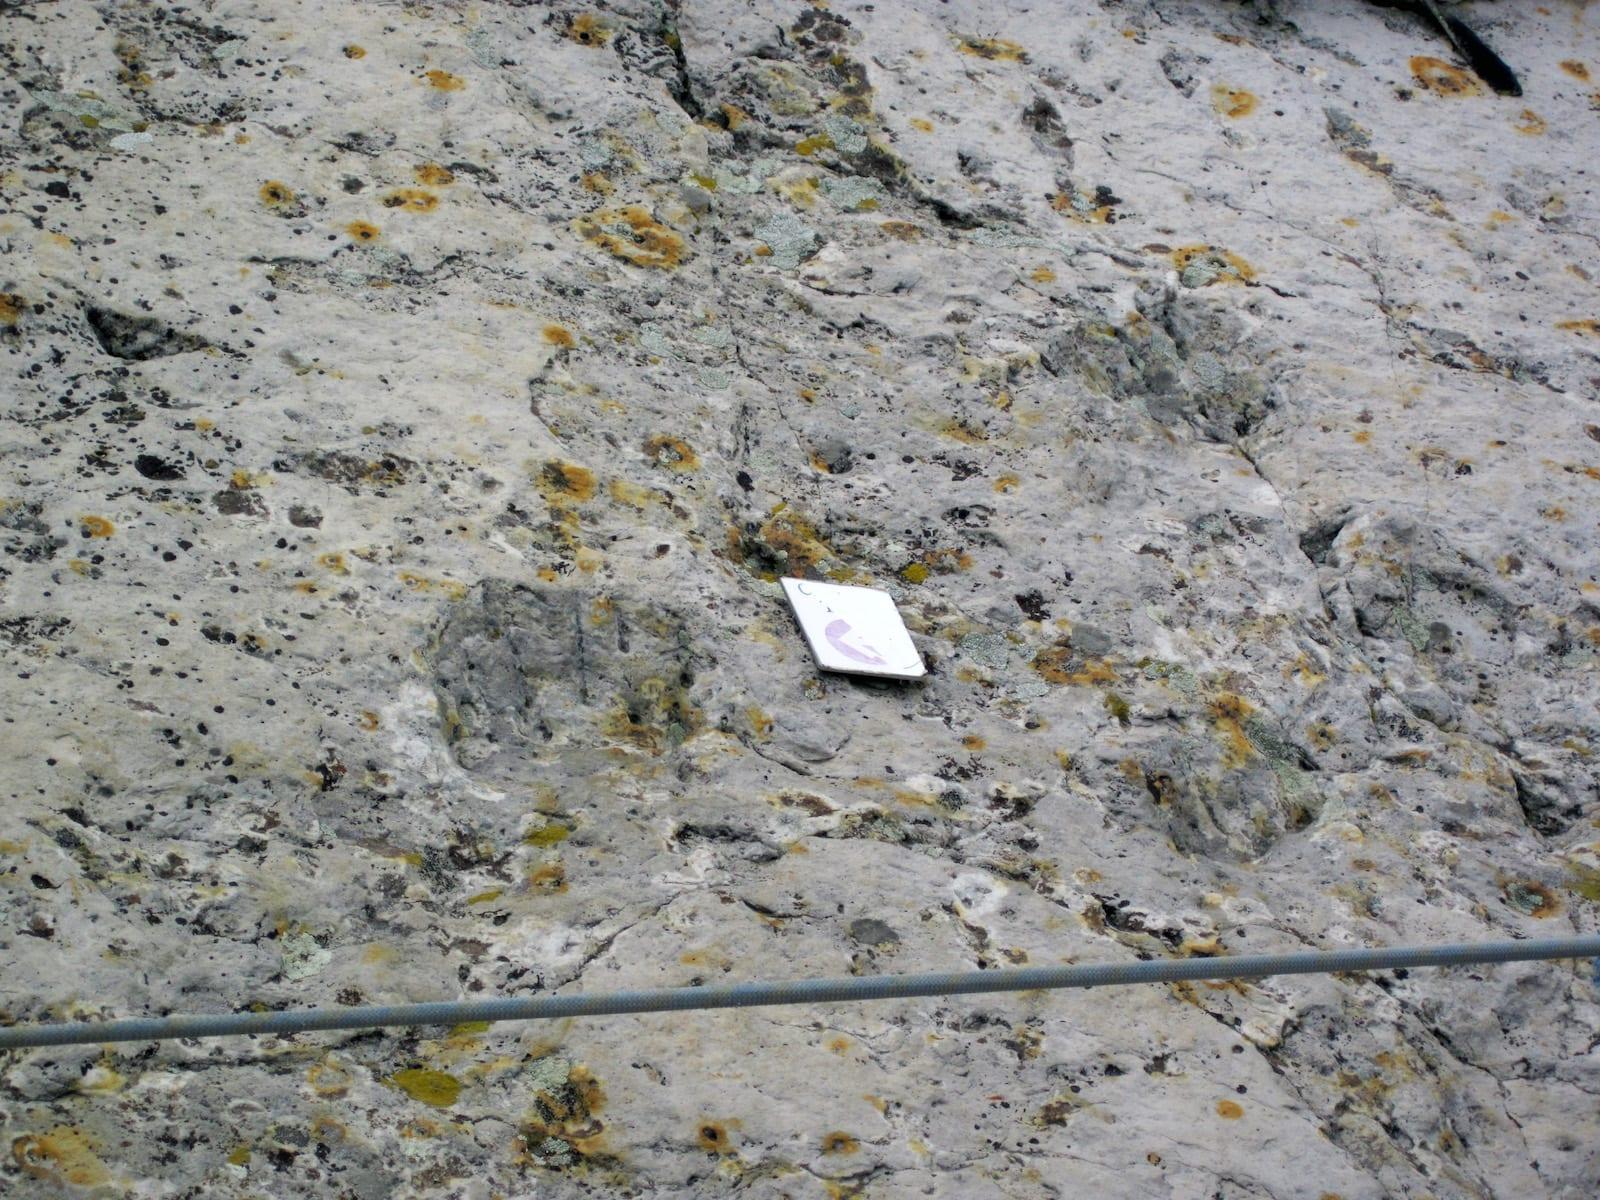 Crocodilian Fossilized Footprints Dinosaur Ridge Morrison CO